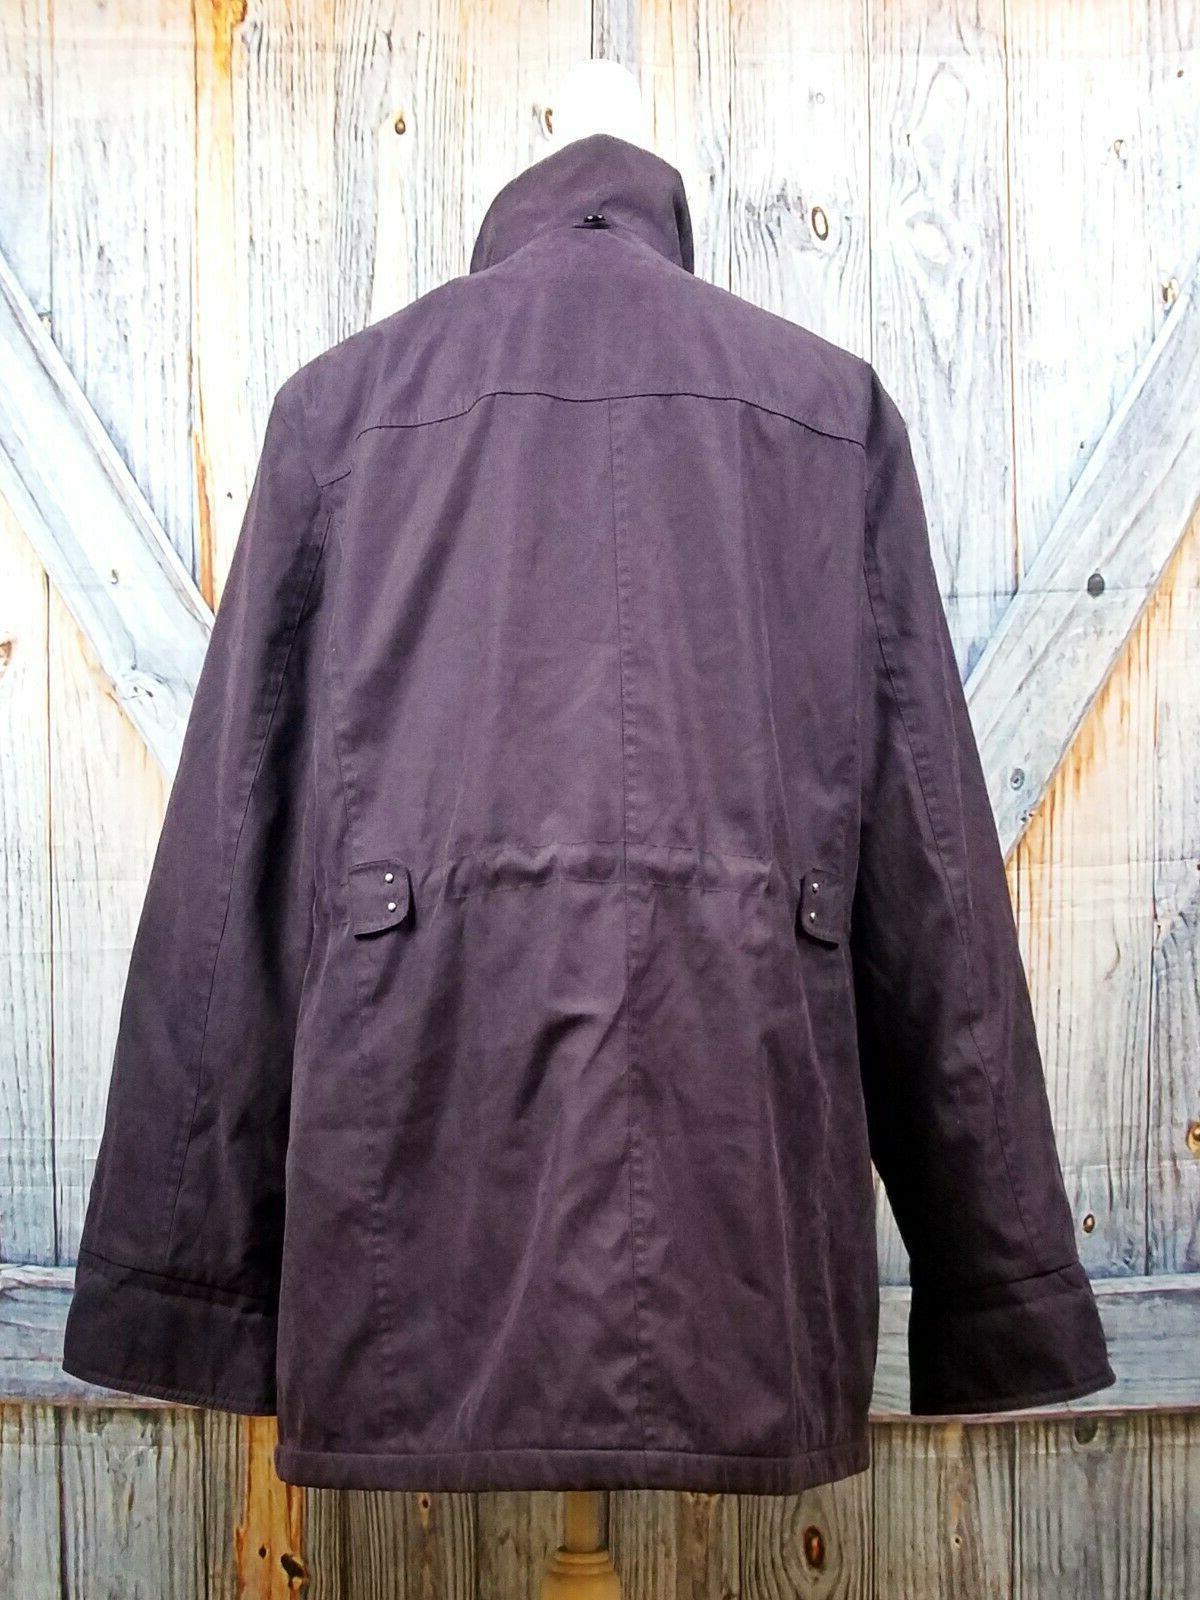 EGGPLANT PURPLE Ski Coat Winter Wind Resistant Jacket XL 1x